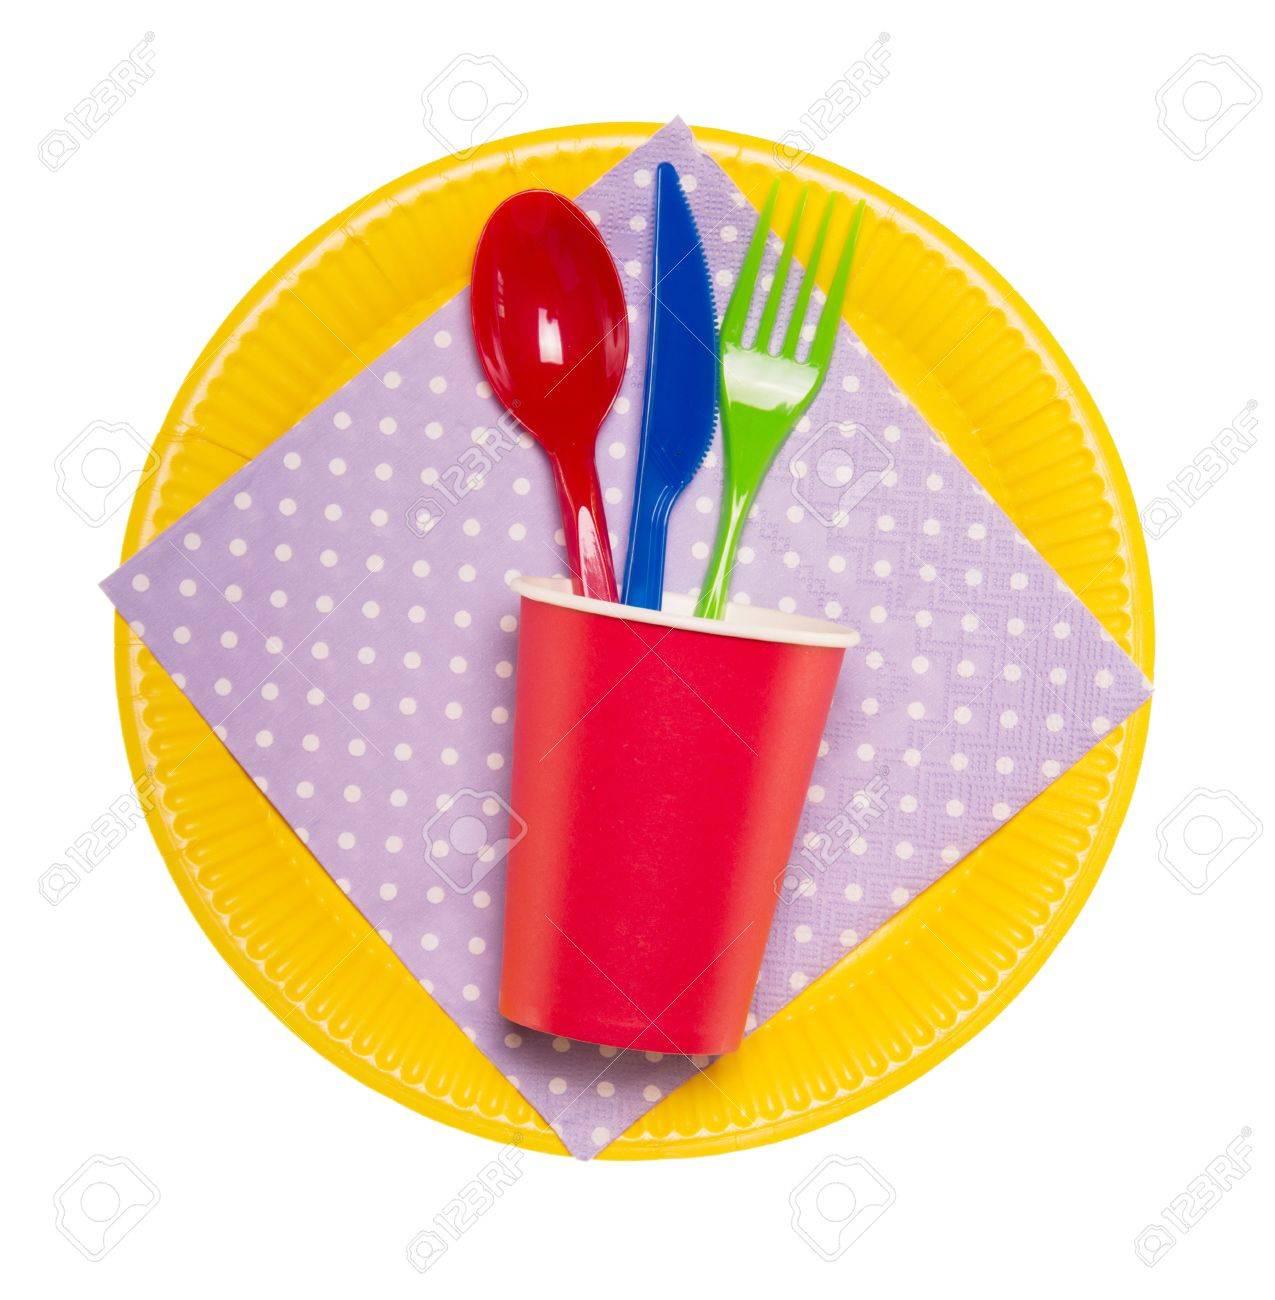 Set brightest disposable tableware plates glasses spoon fork knife glass  sc 1 st  123RF.com & Set Brightest Disposable Tableware: Plates Glasses Spoon Fork ...